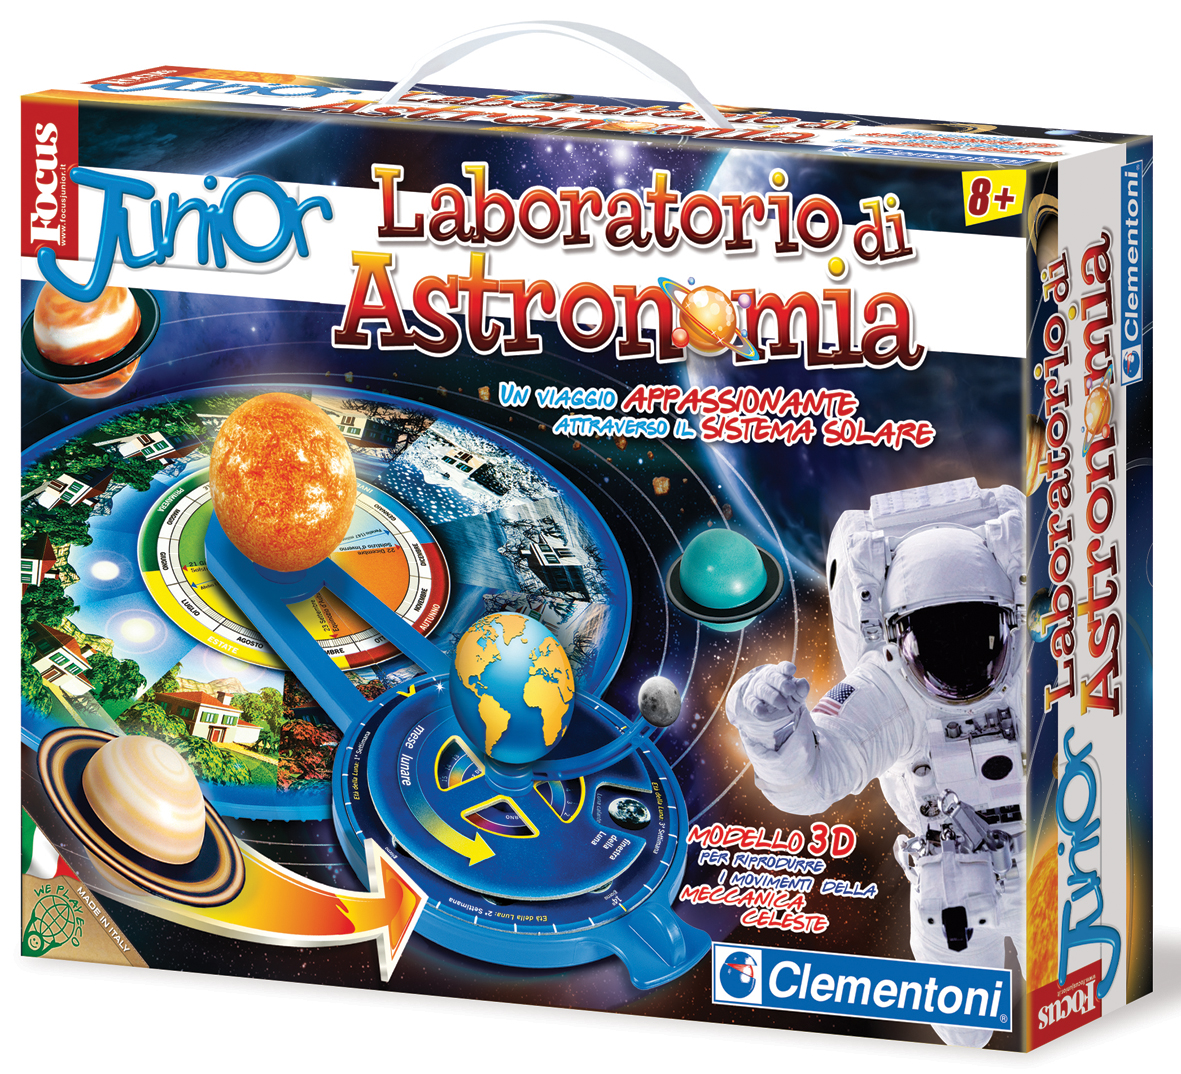 FOCUS LABORATORIO ASTRONOMIA